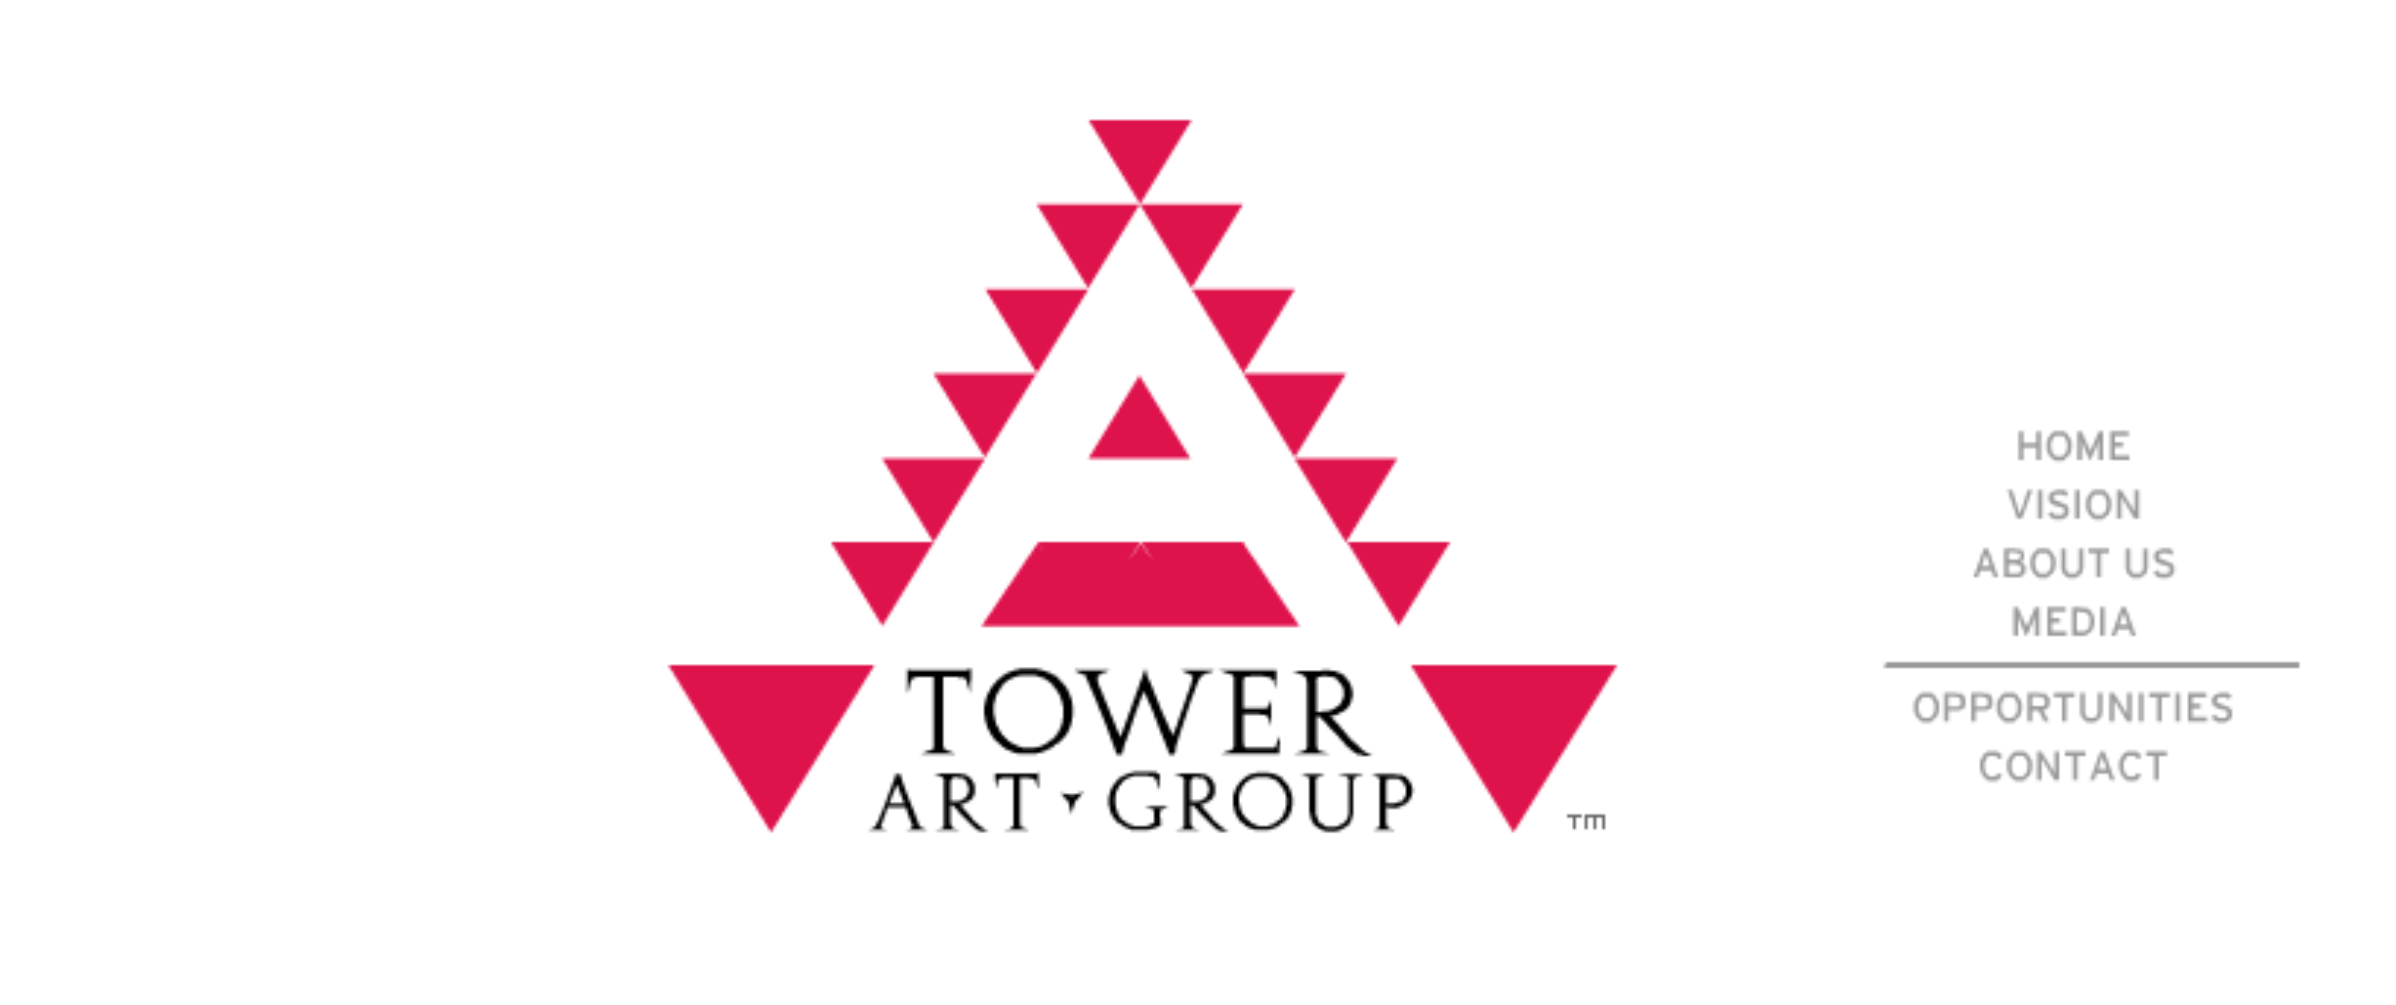 Tower Art Group.com Sitework